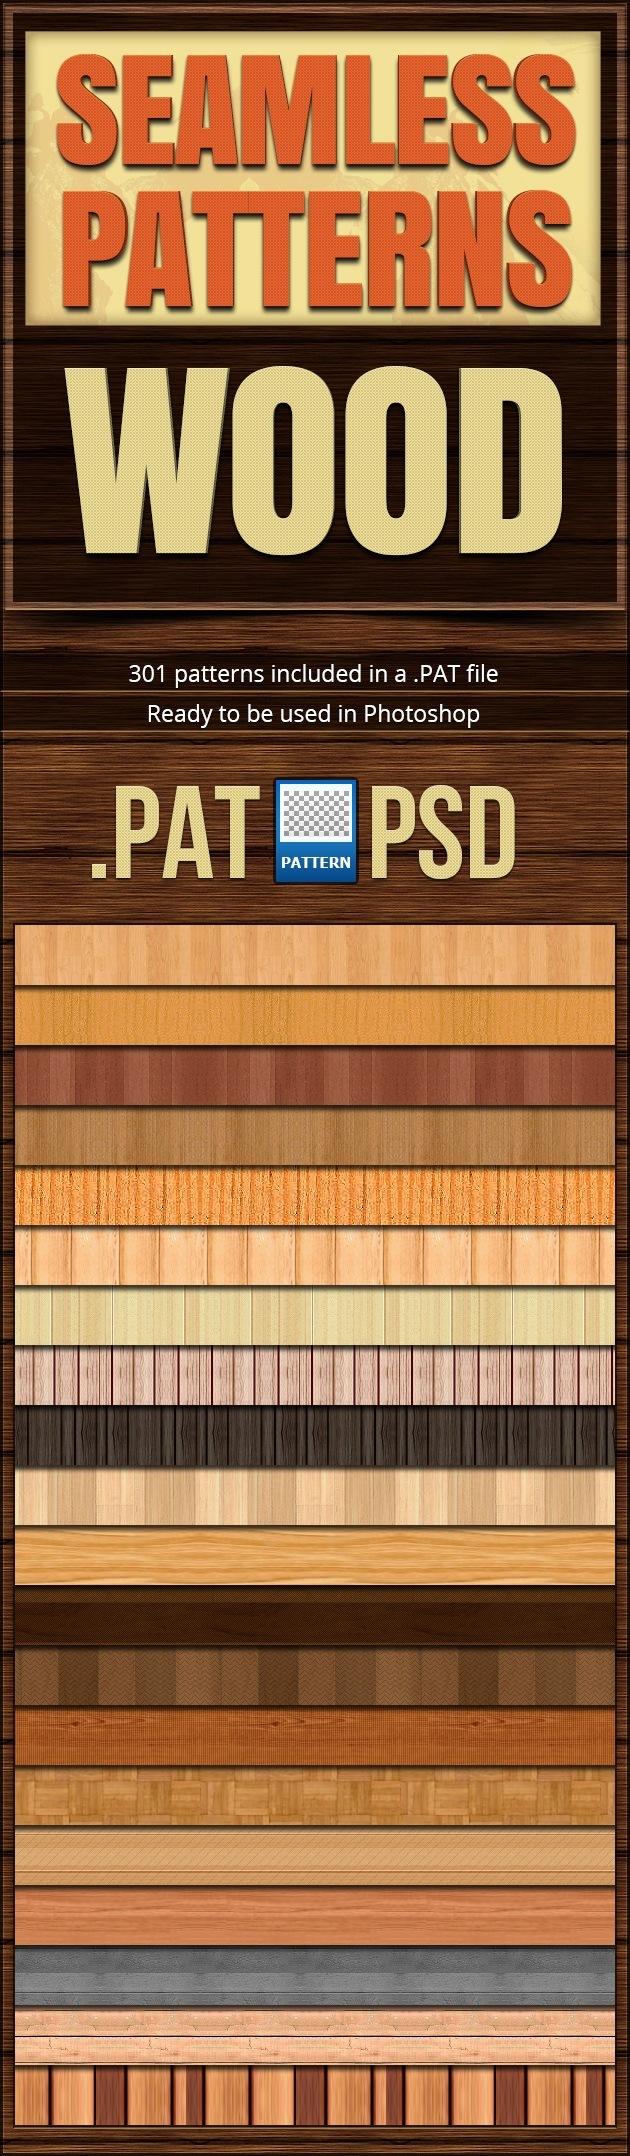 INTRO_SeamlessPatterns_Wood